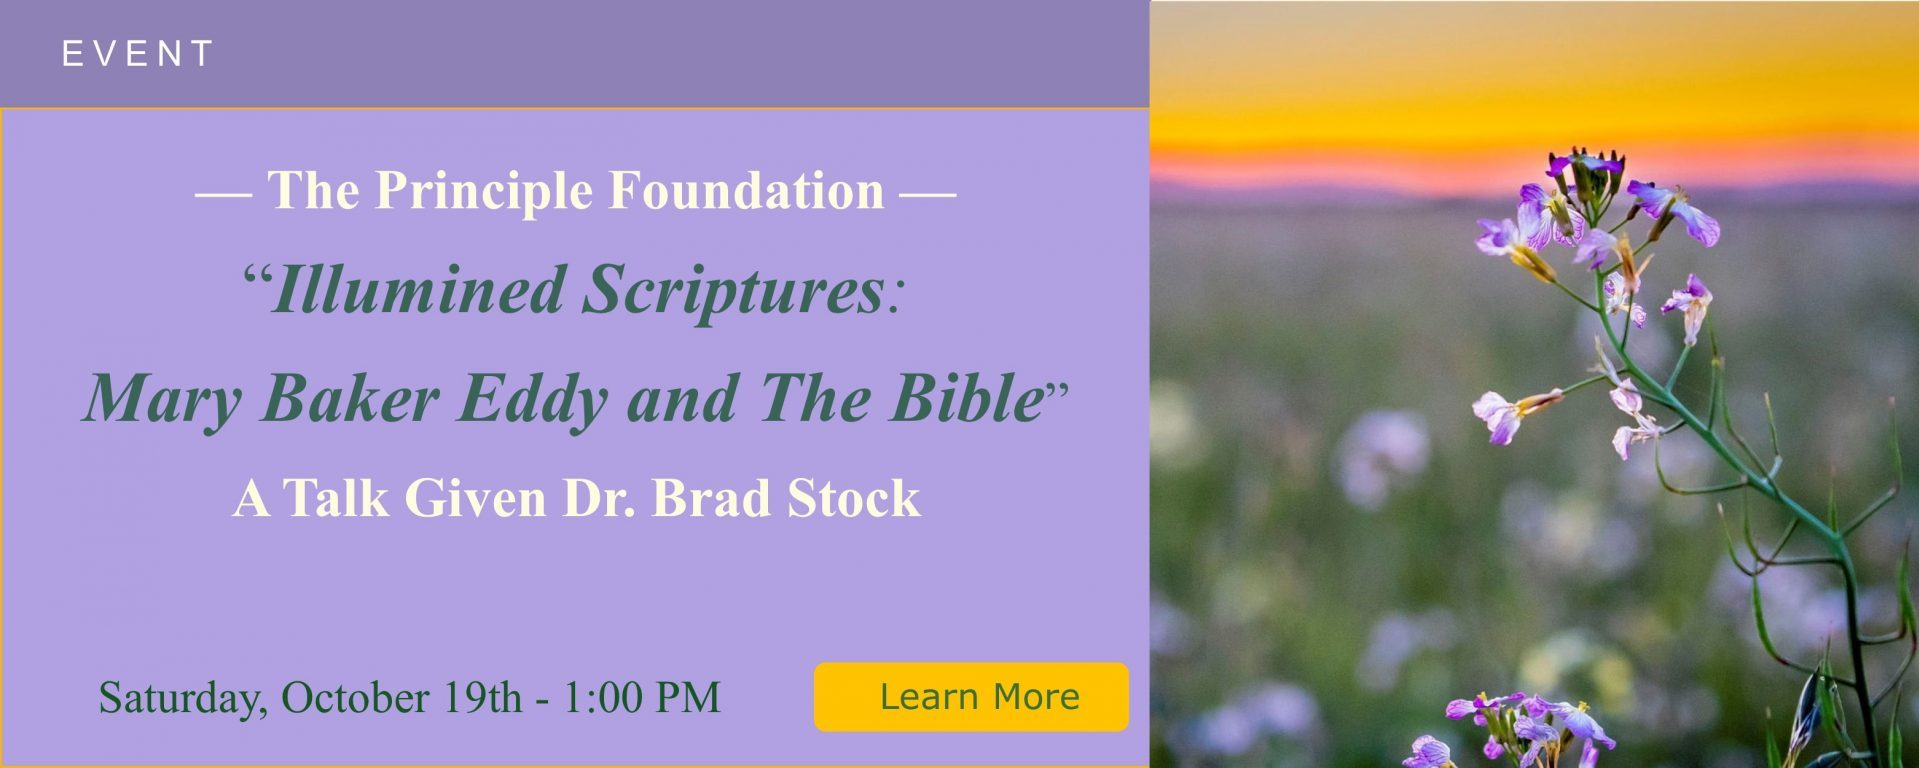 Principle Foundation Dr. Brad Stock 1